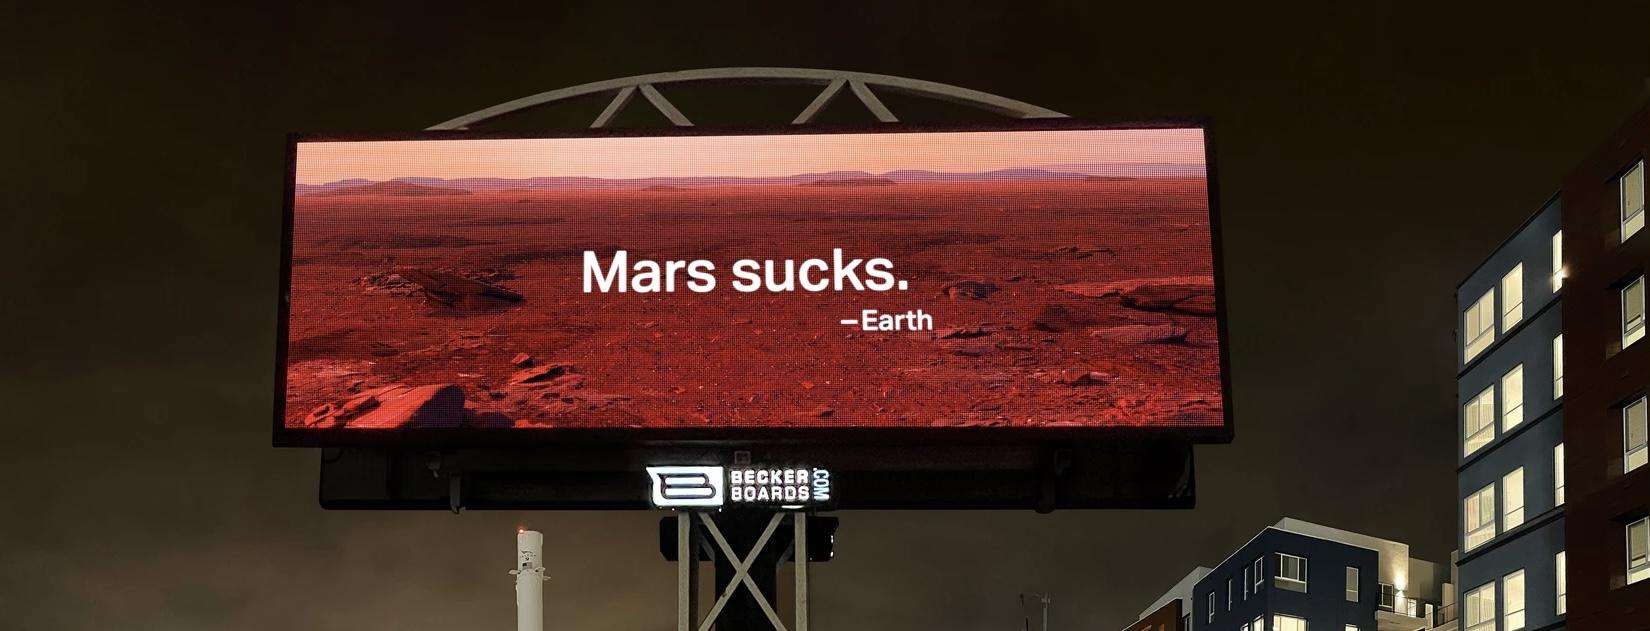 Mars sucks